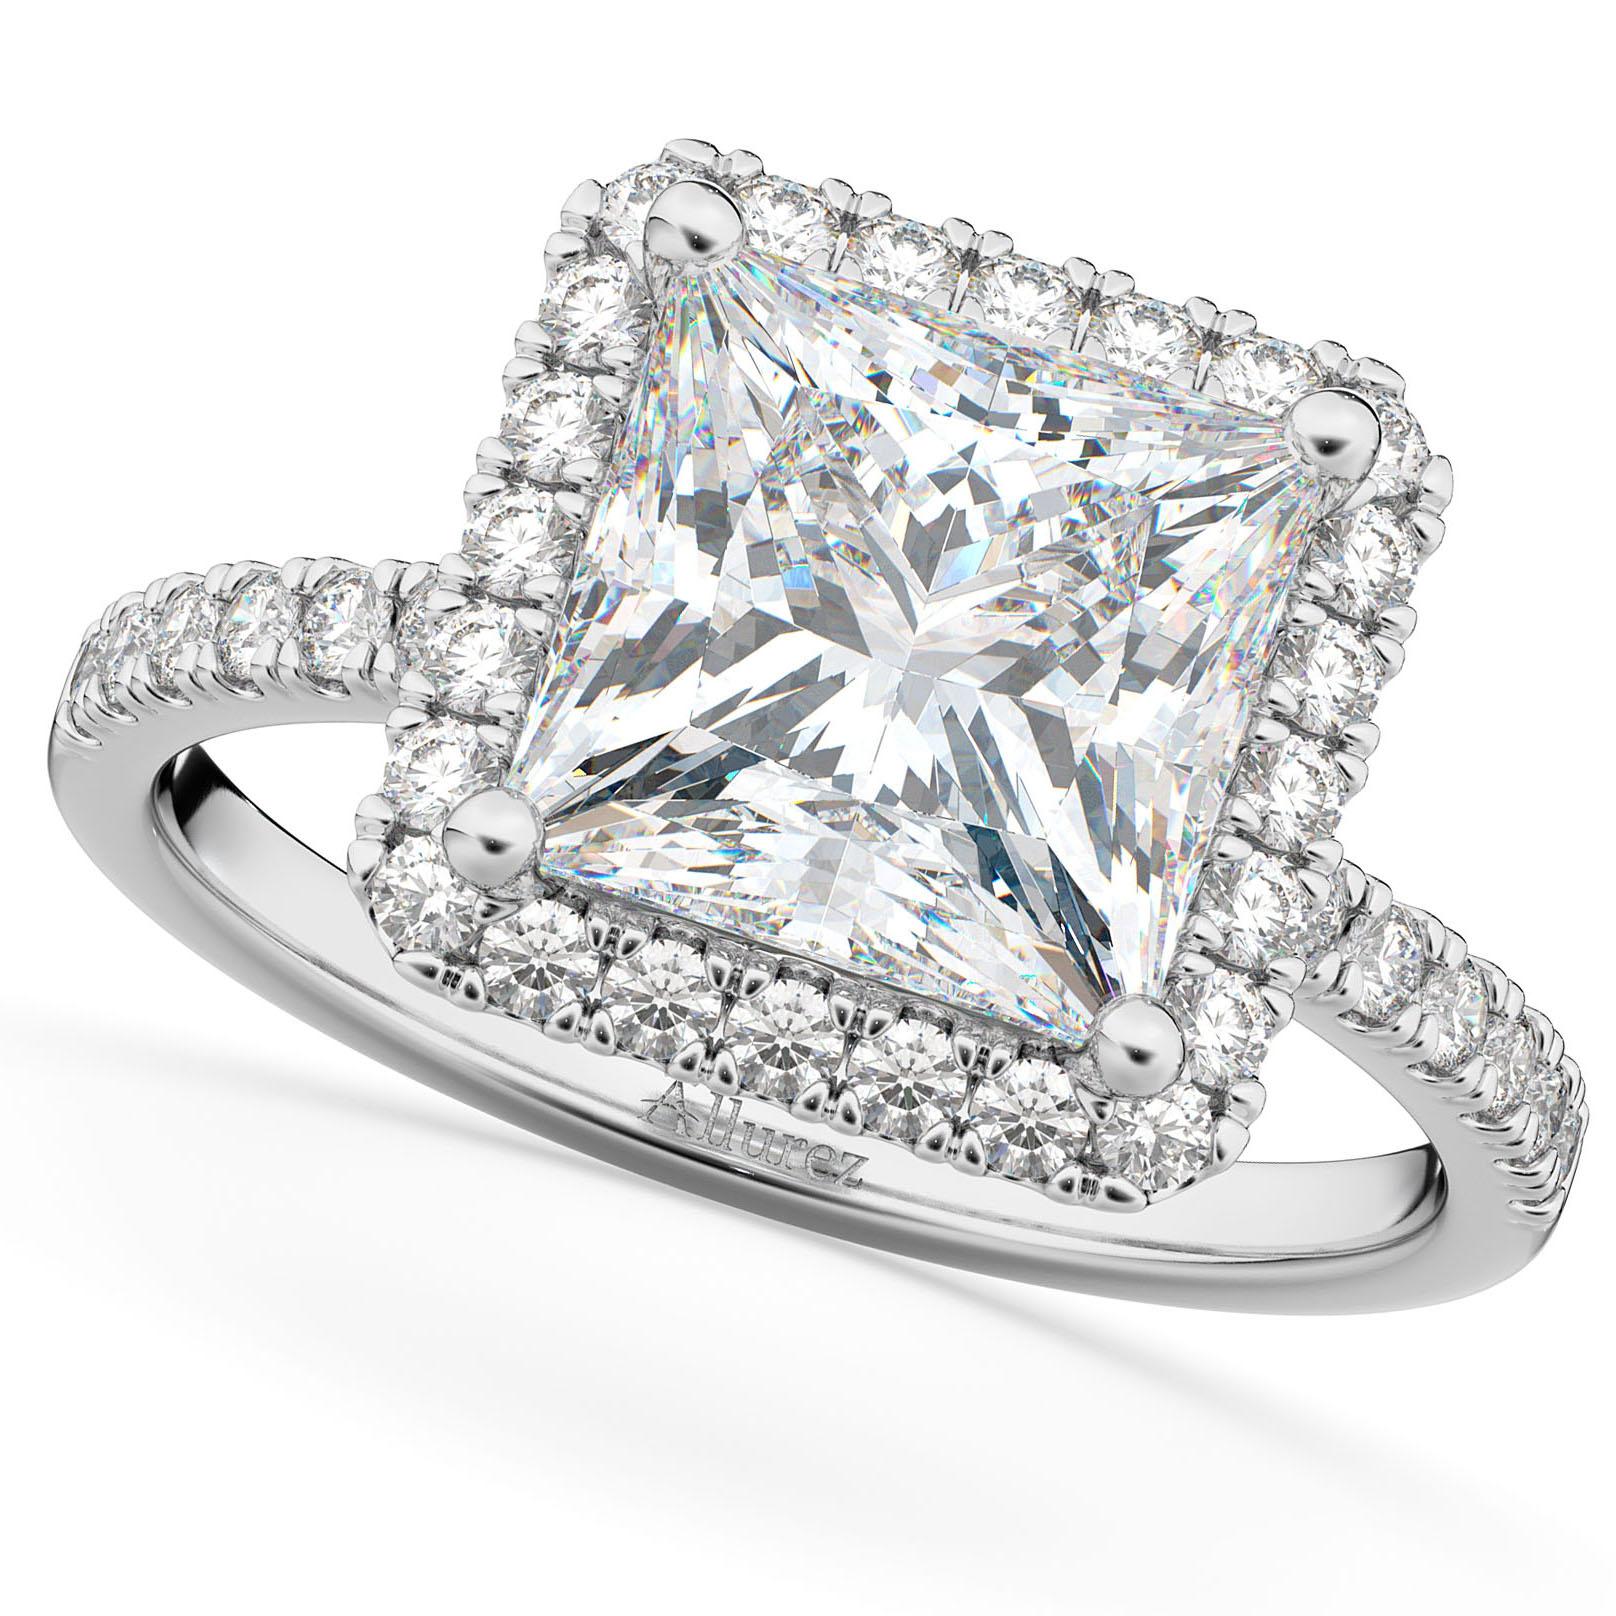 Princess Cut Halo Diamond Engagement Ring 14K White Gold (3.58ct)